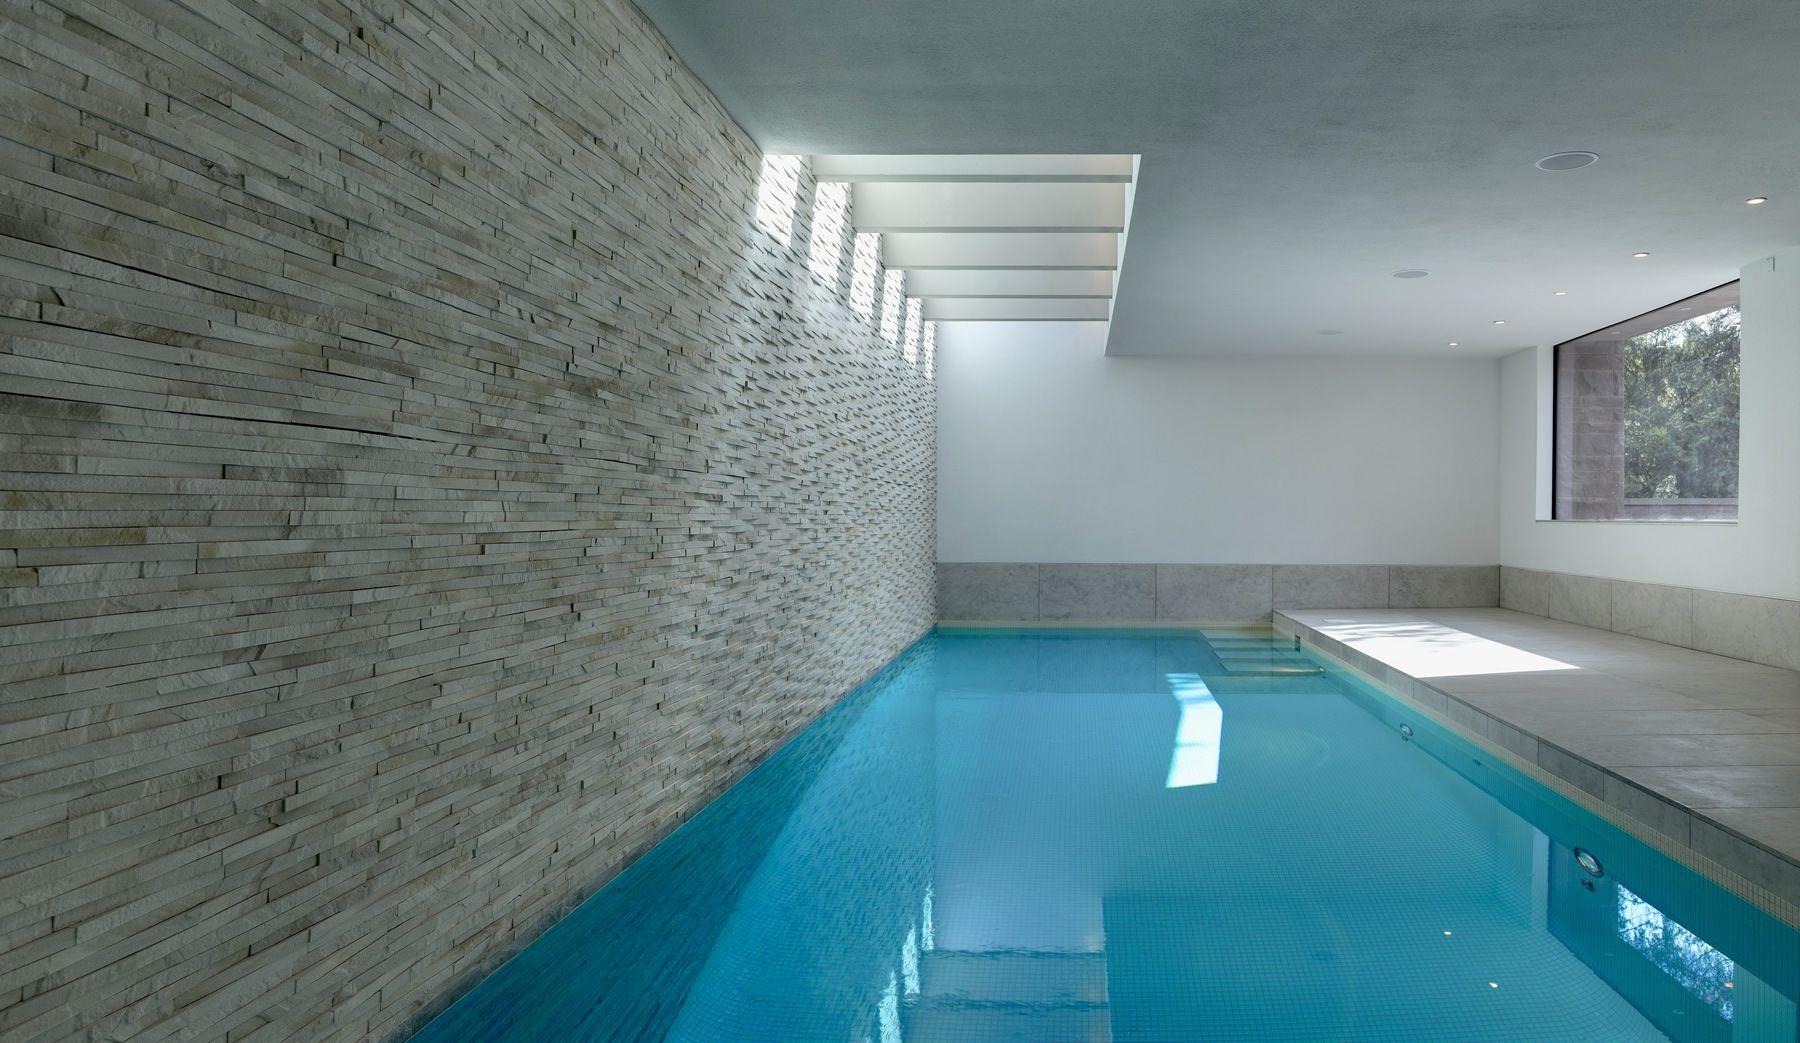 striking indoor pool by portrait pools schwimmbad planen indoor pools. Black Bedroom Furniture Sets. Home Design Ideas